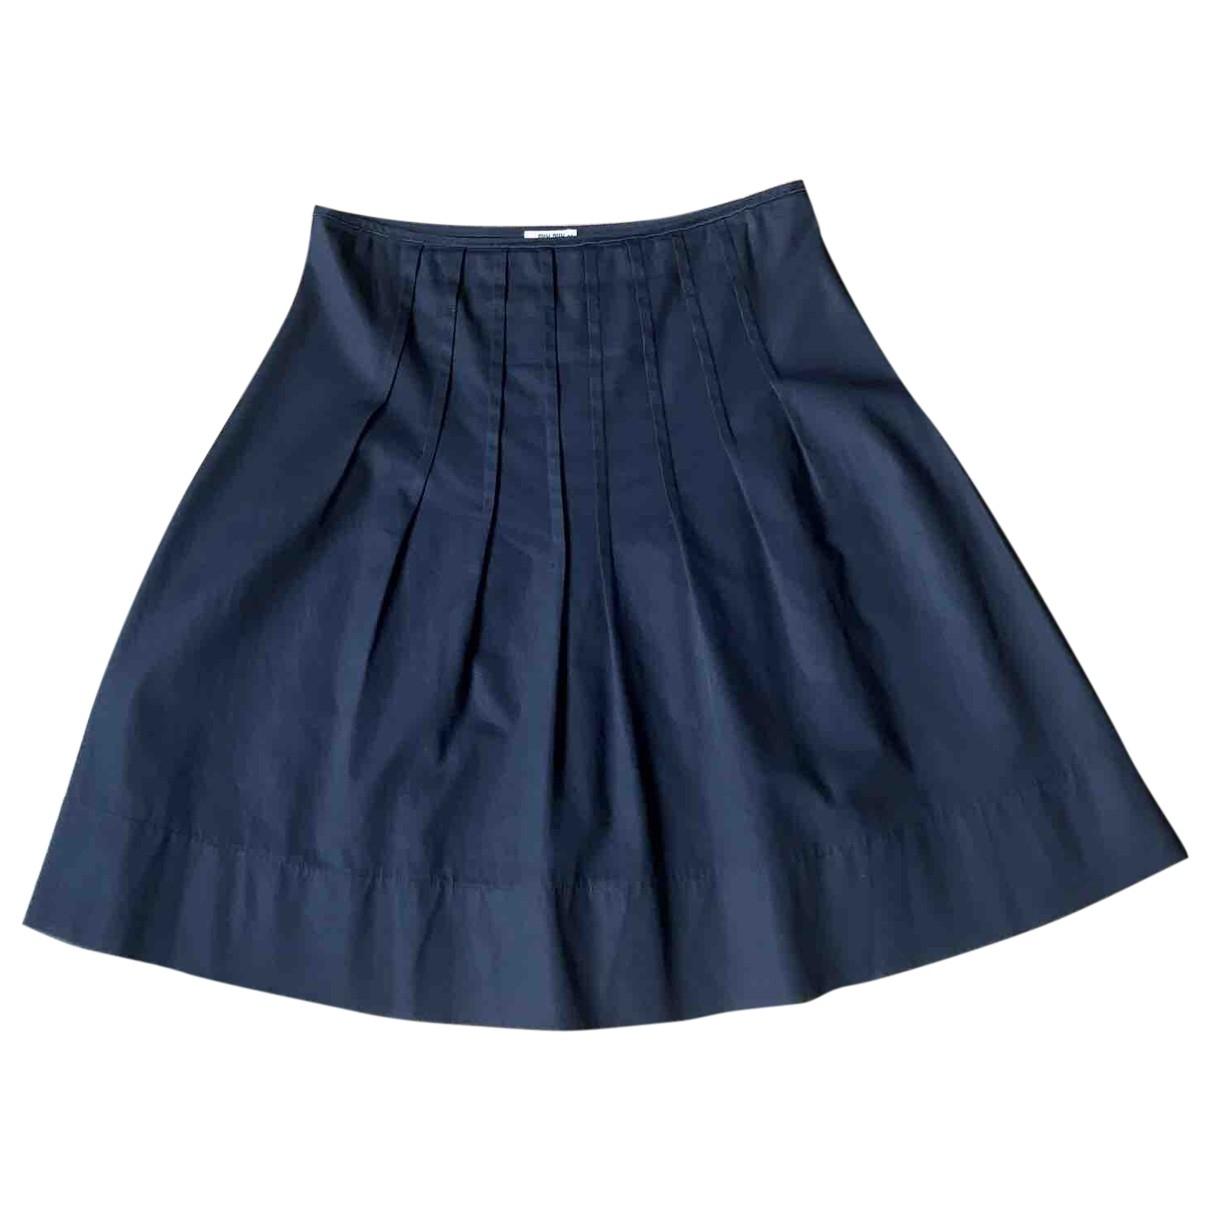 Miu Miu \N Blue Cotton skirt for Women 44 IT